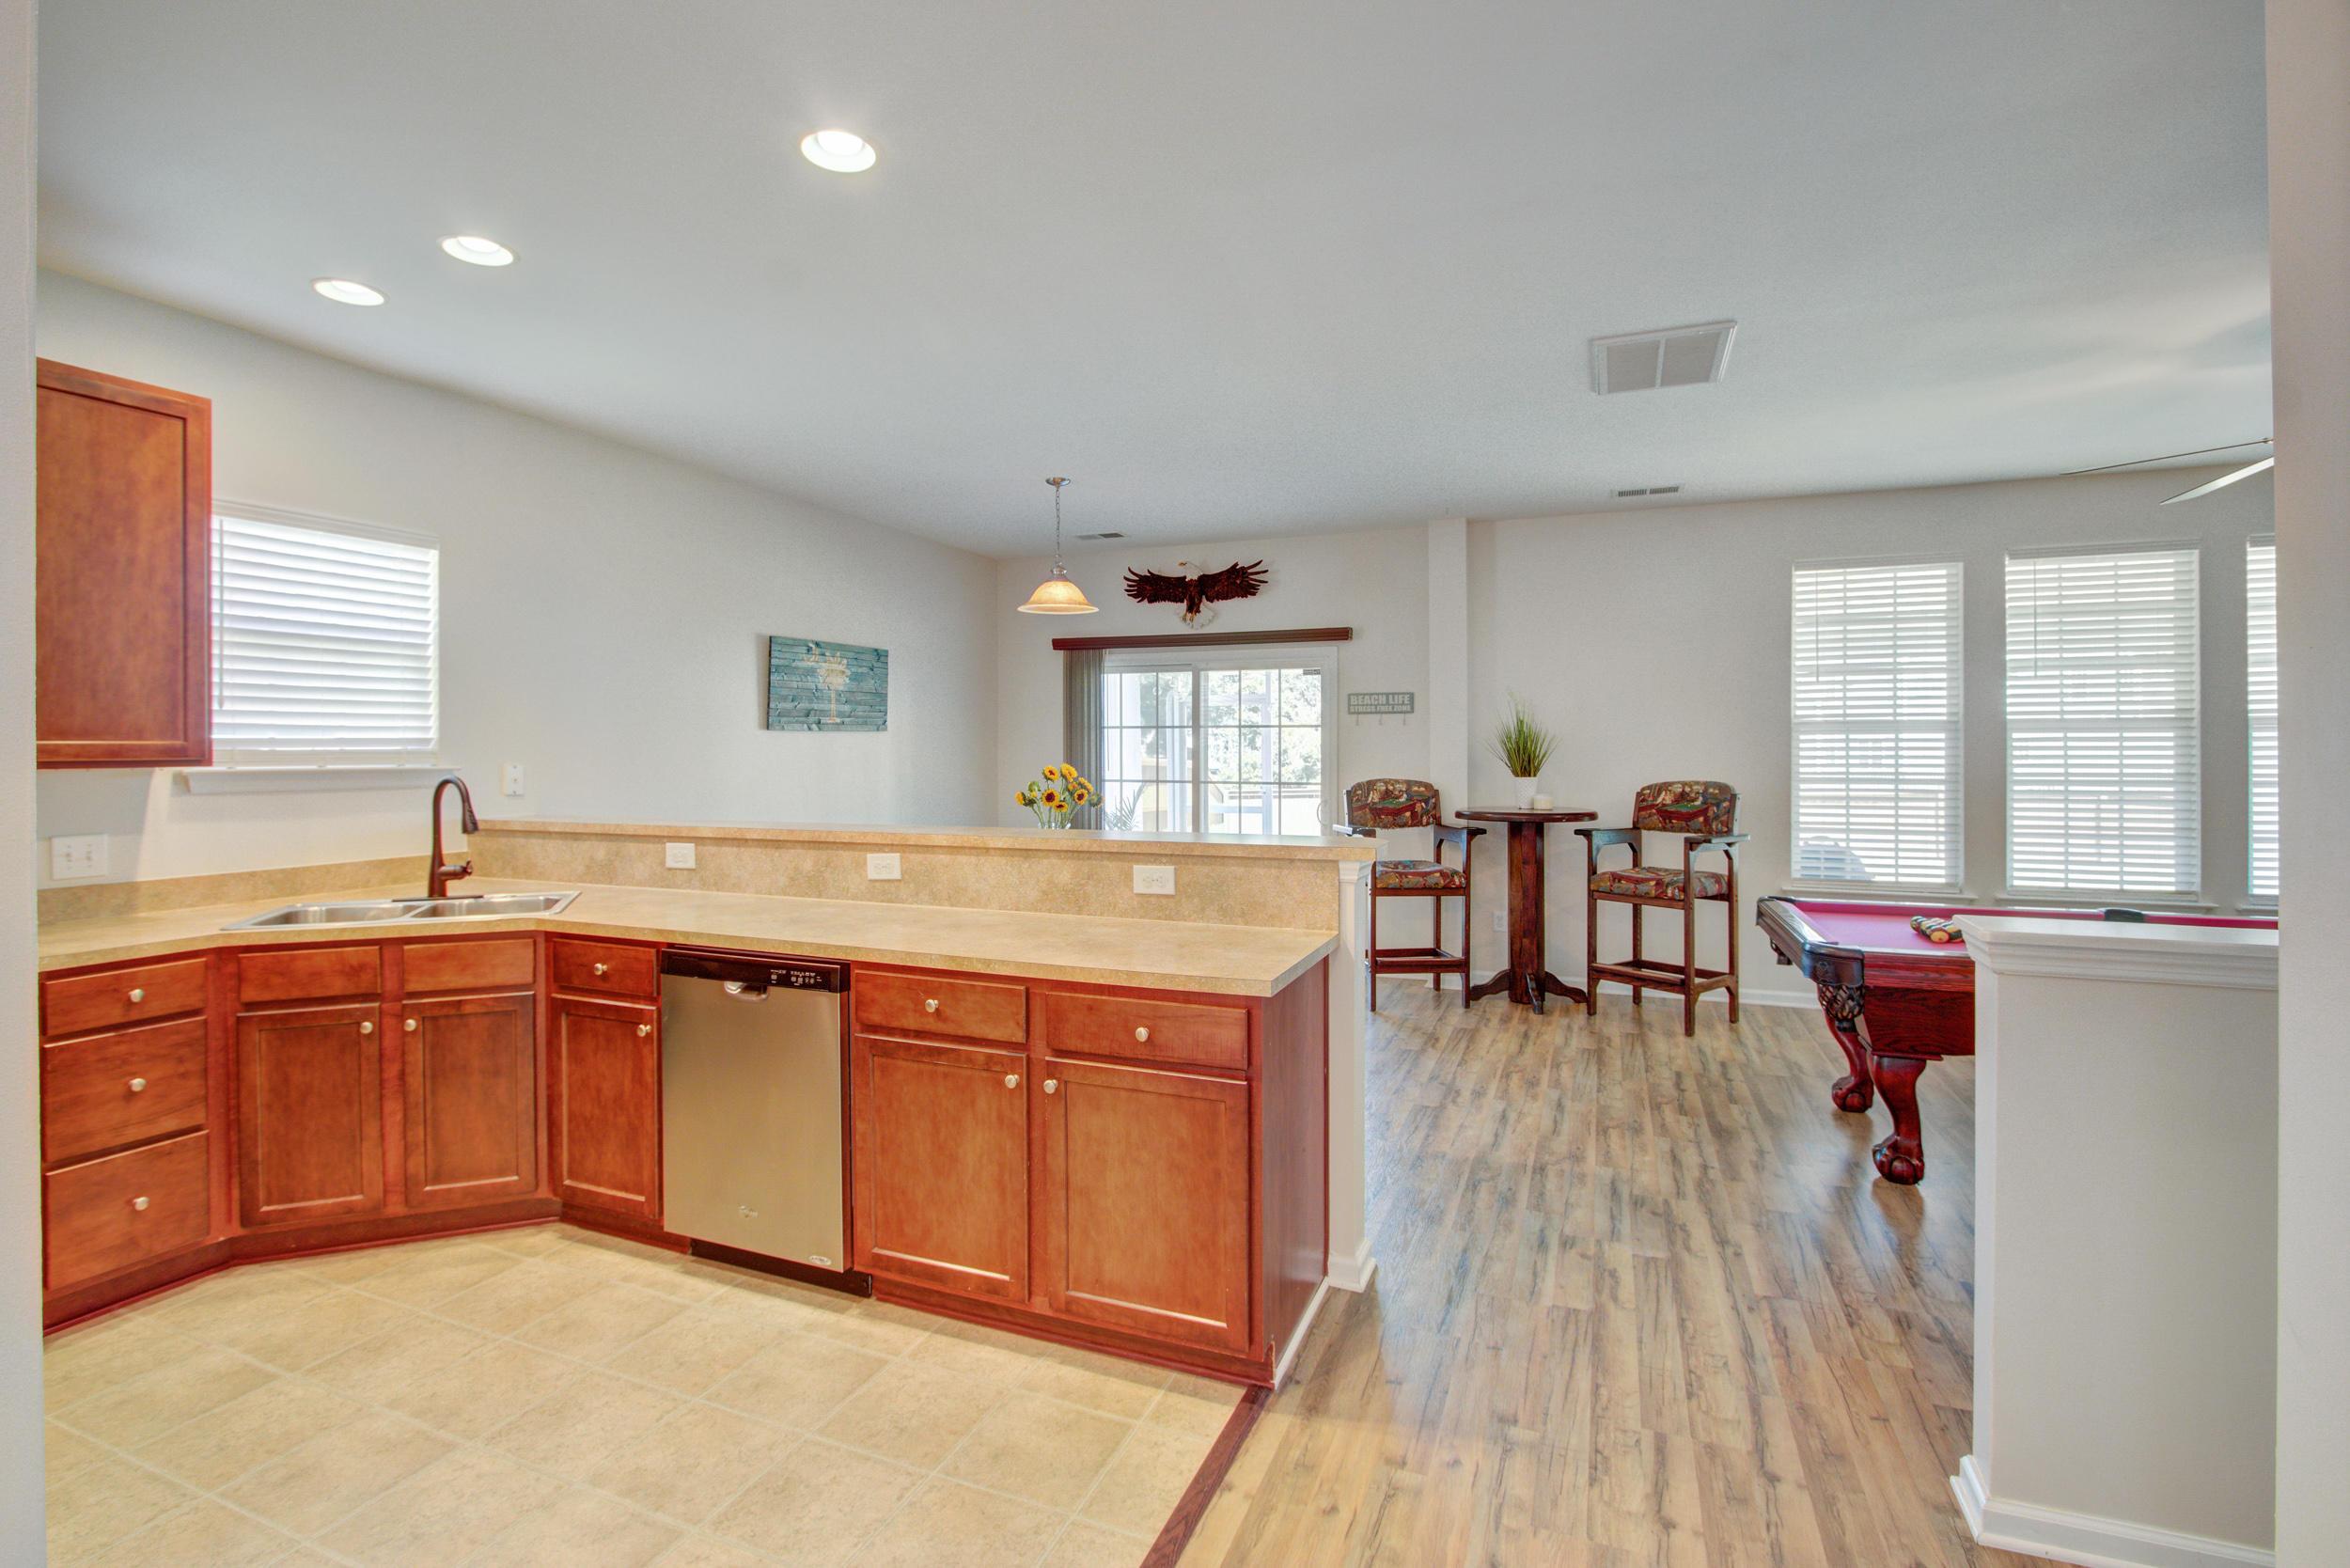 Oakley Pointe Homes For Sale - 576 English Oak, Moncks Corner, SC - 57